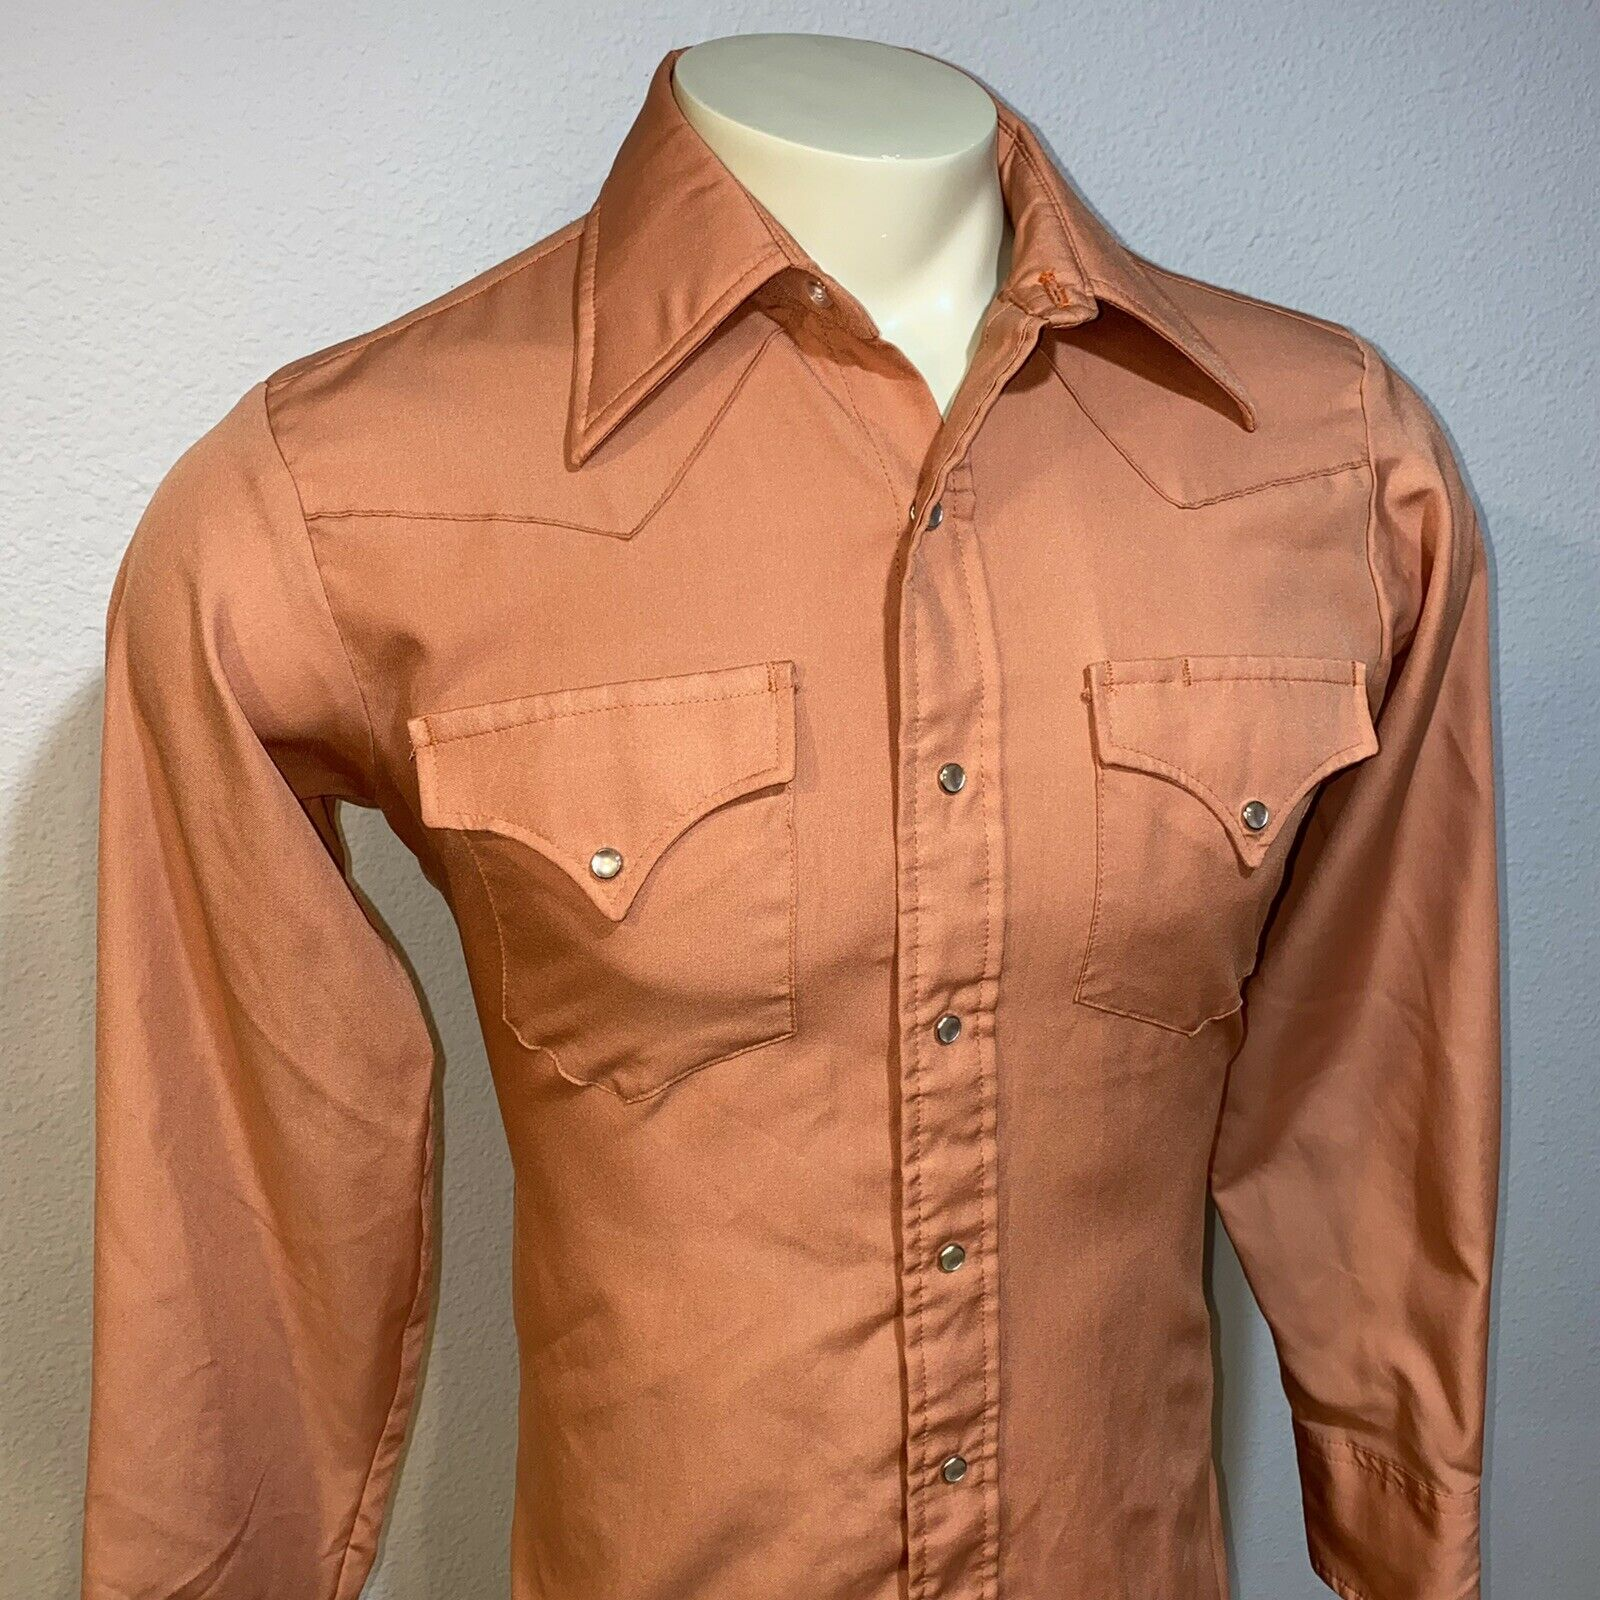 Size medium. 70/'s Le Chevron long sleeve shirt